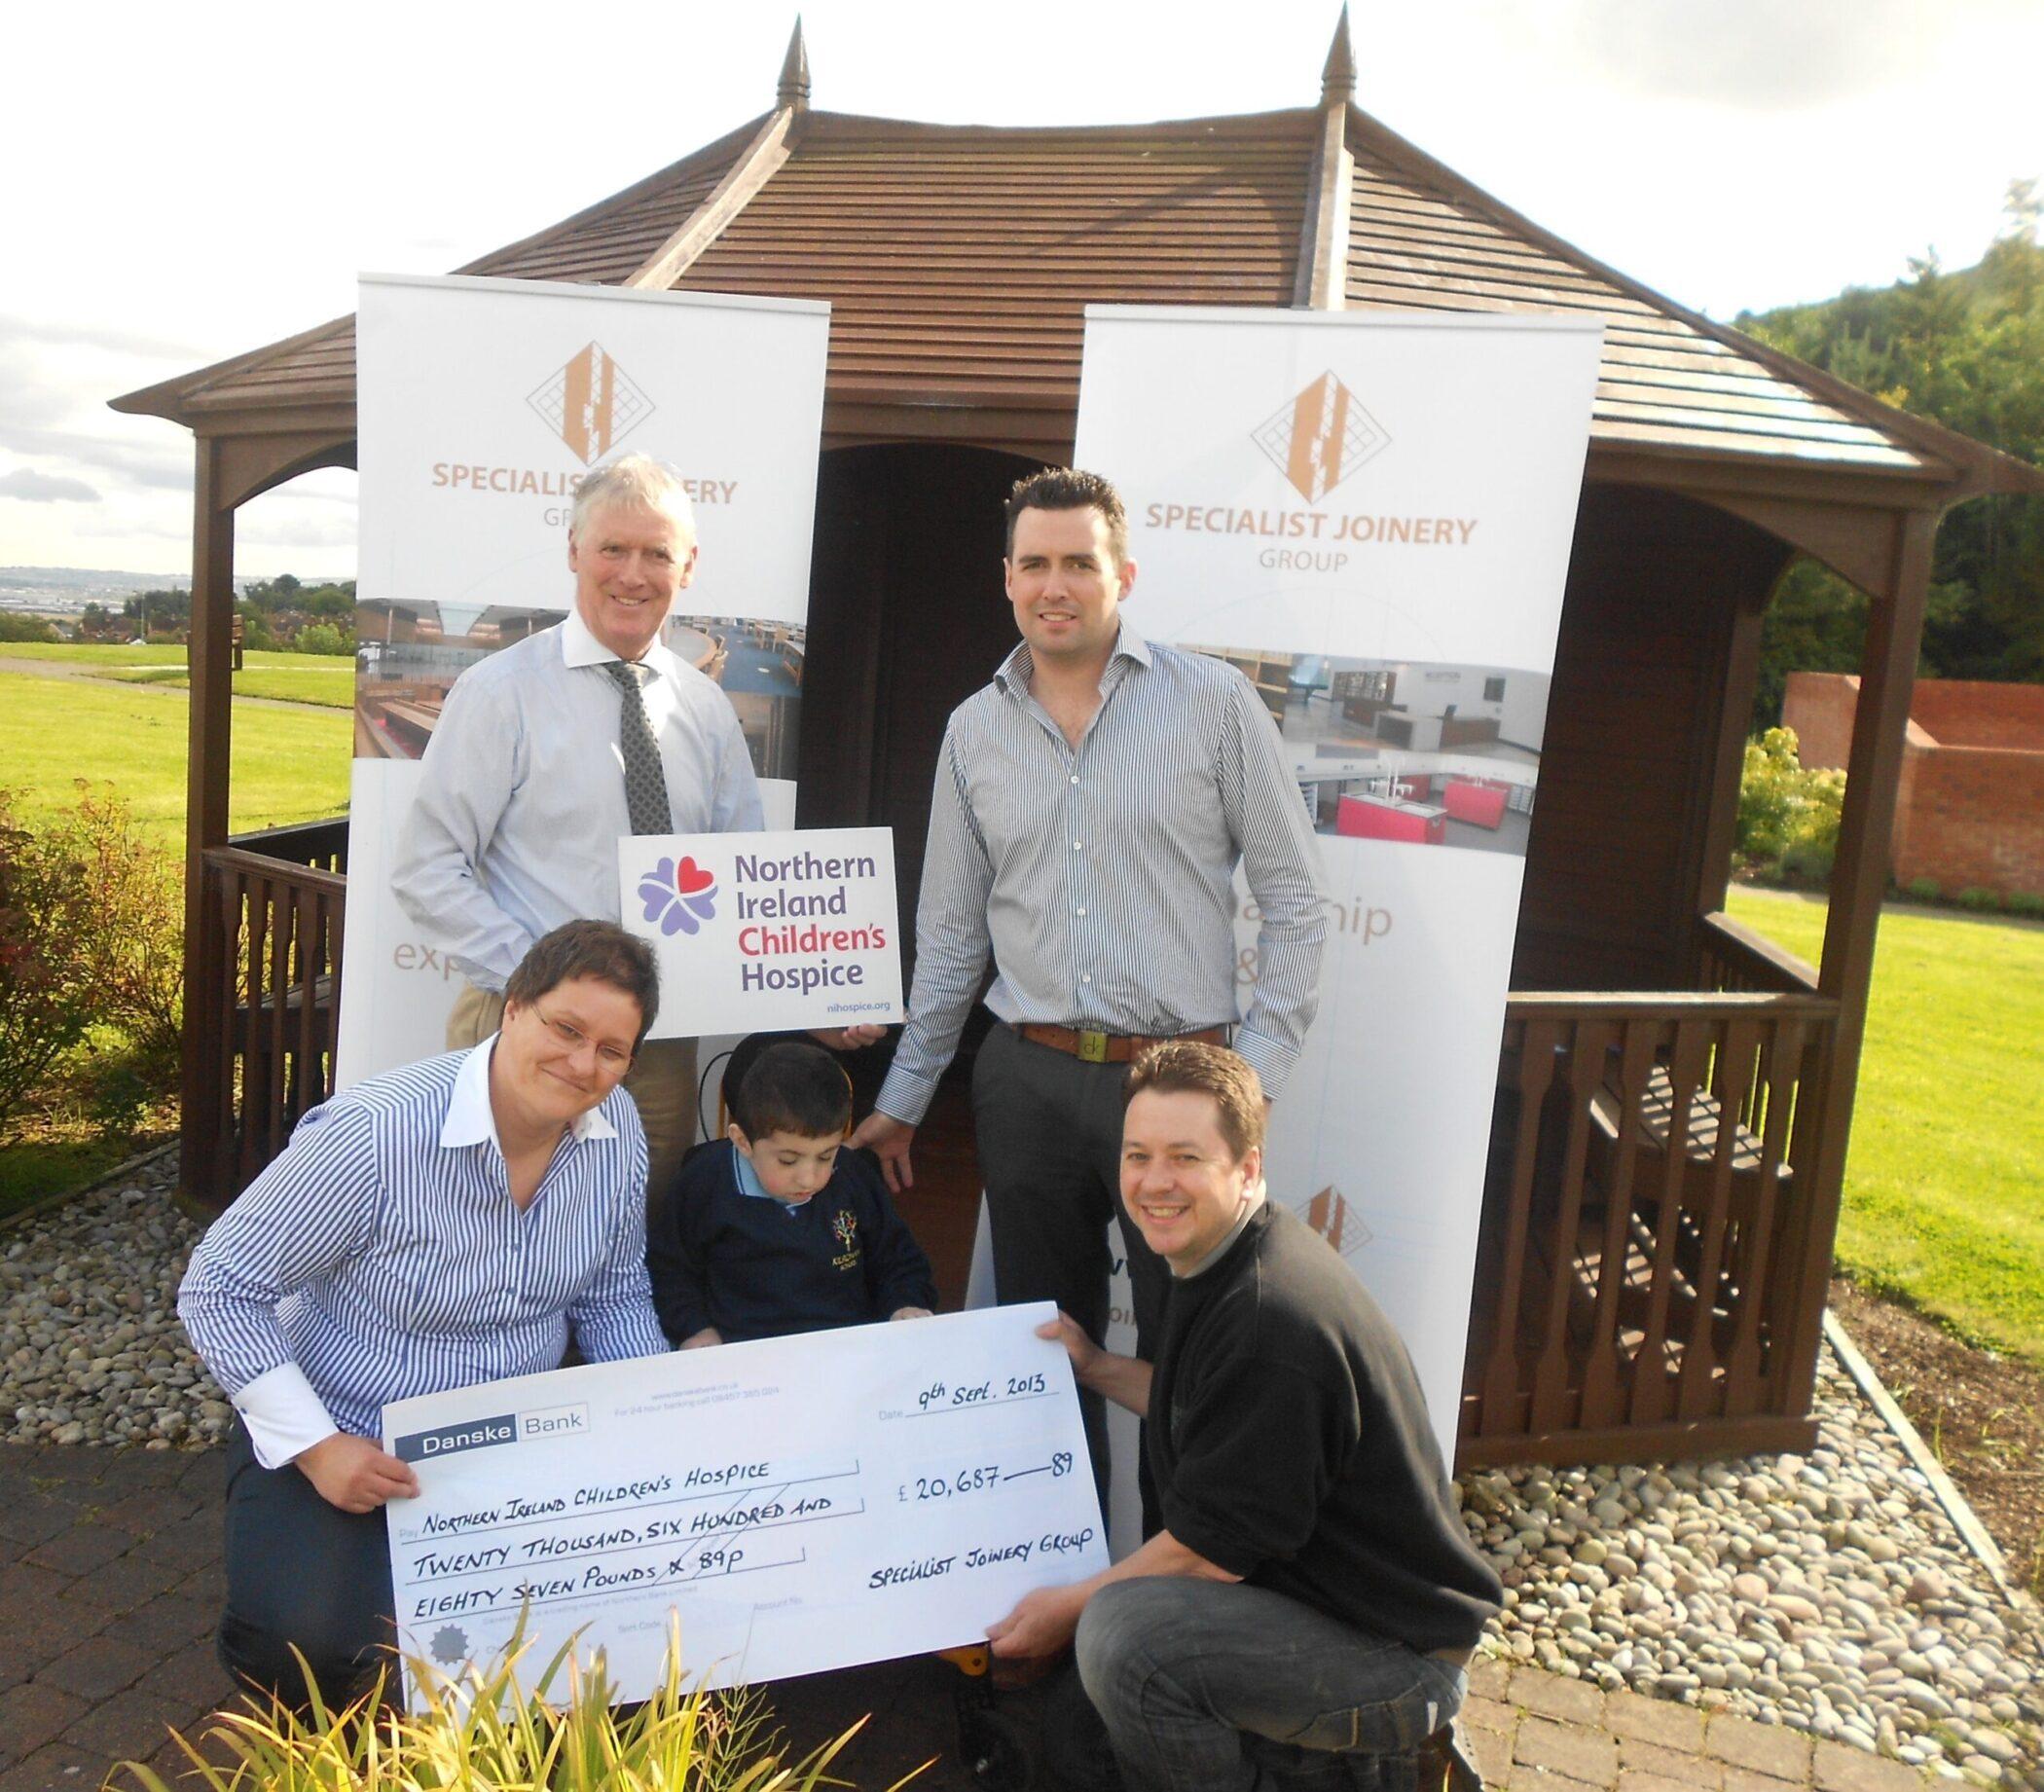 John Bosco and Sean O'Hagan presenting donation of £20,657 to NI Children's Hospice